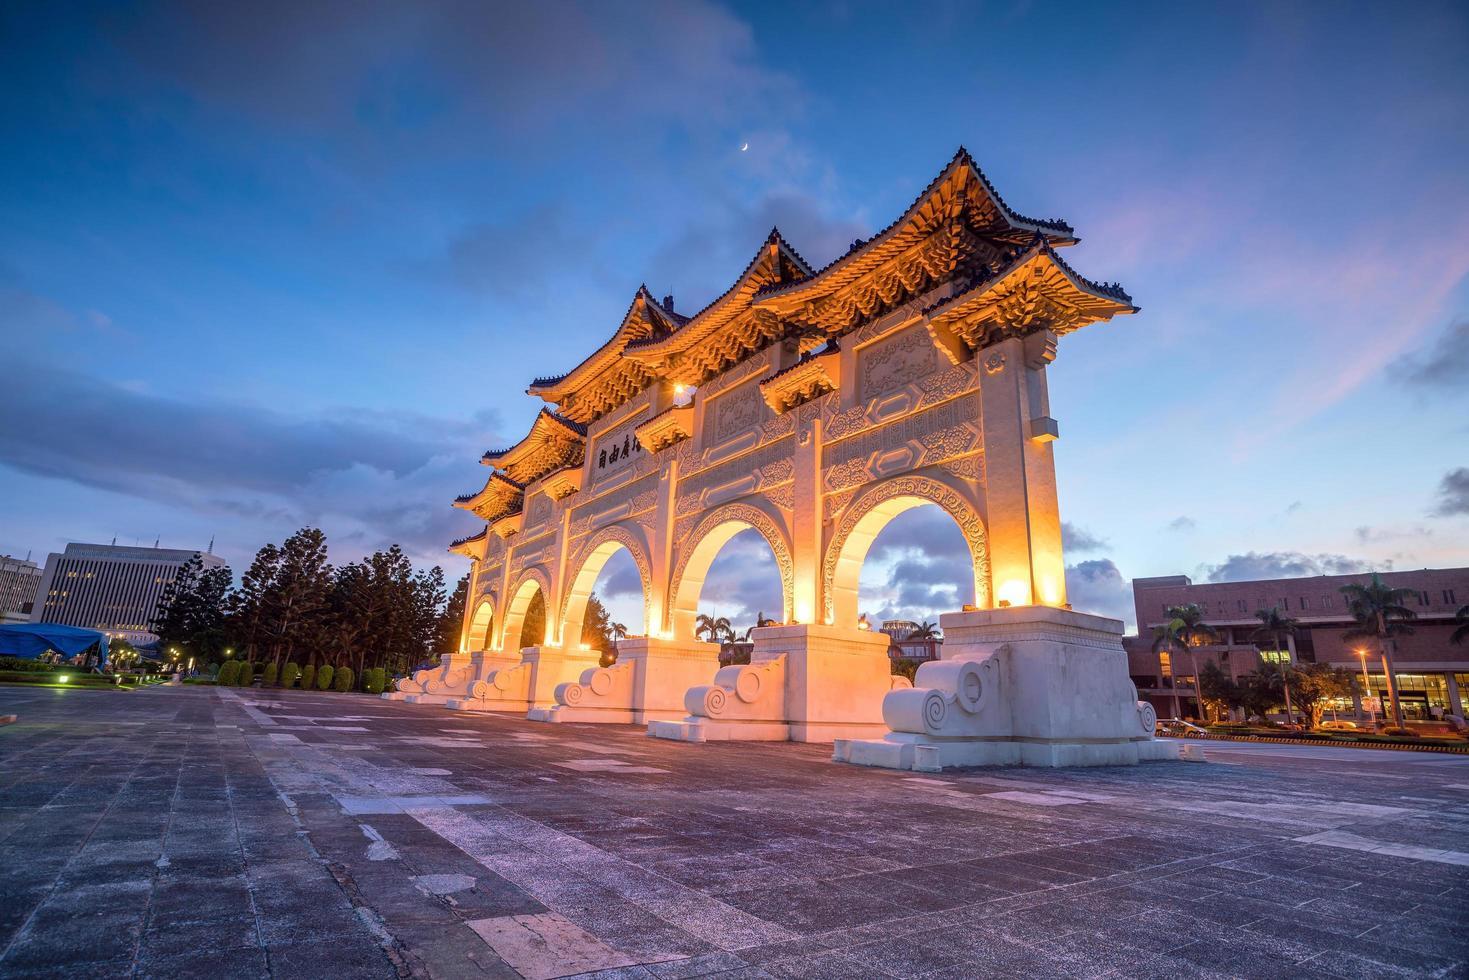 Main Gate of National Chiang Kai-shek Memorial Hall in Taipei City photo